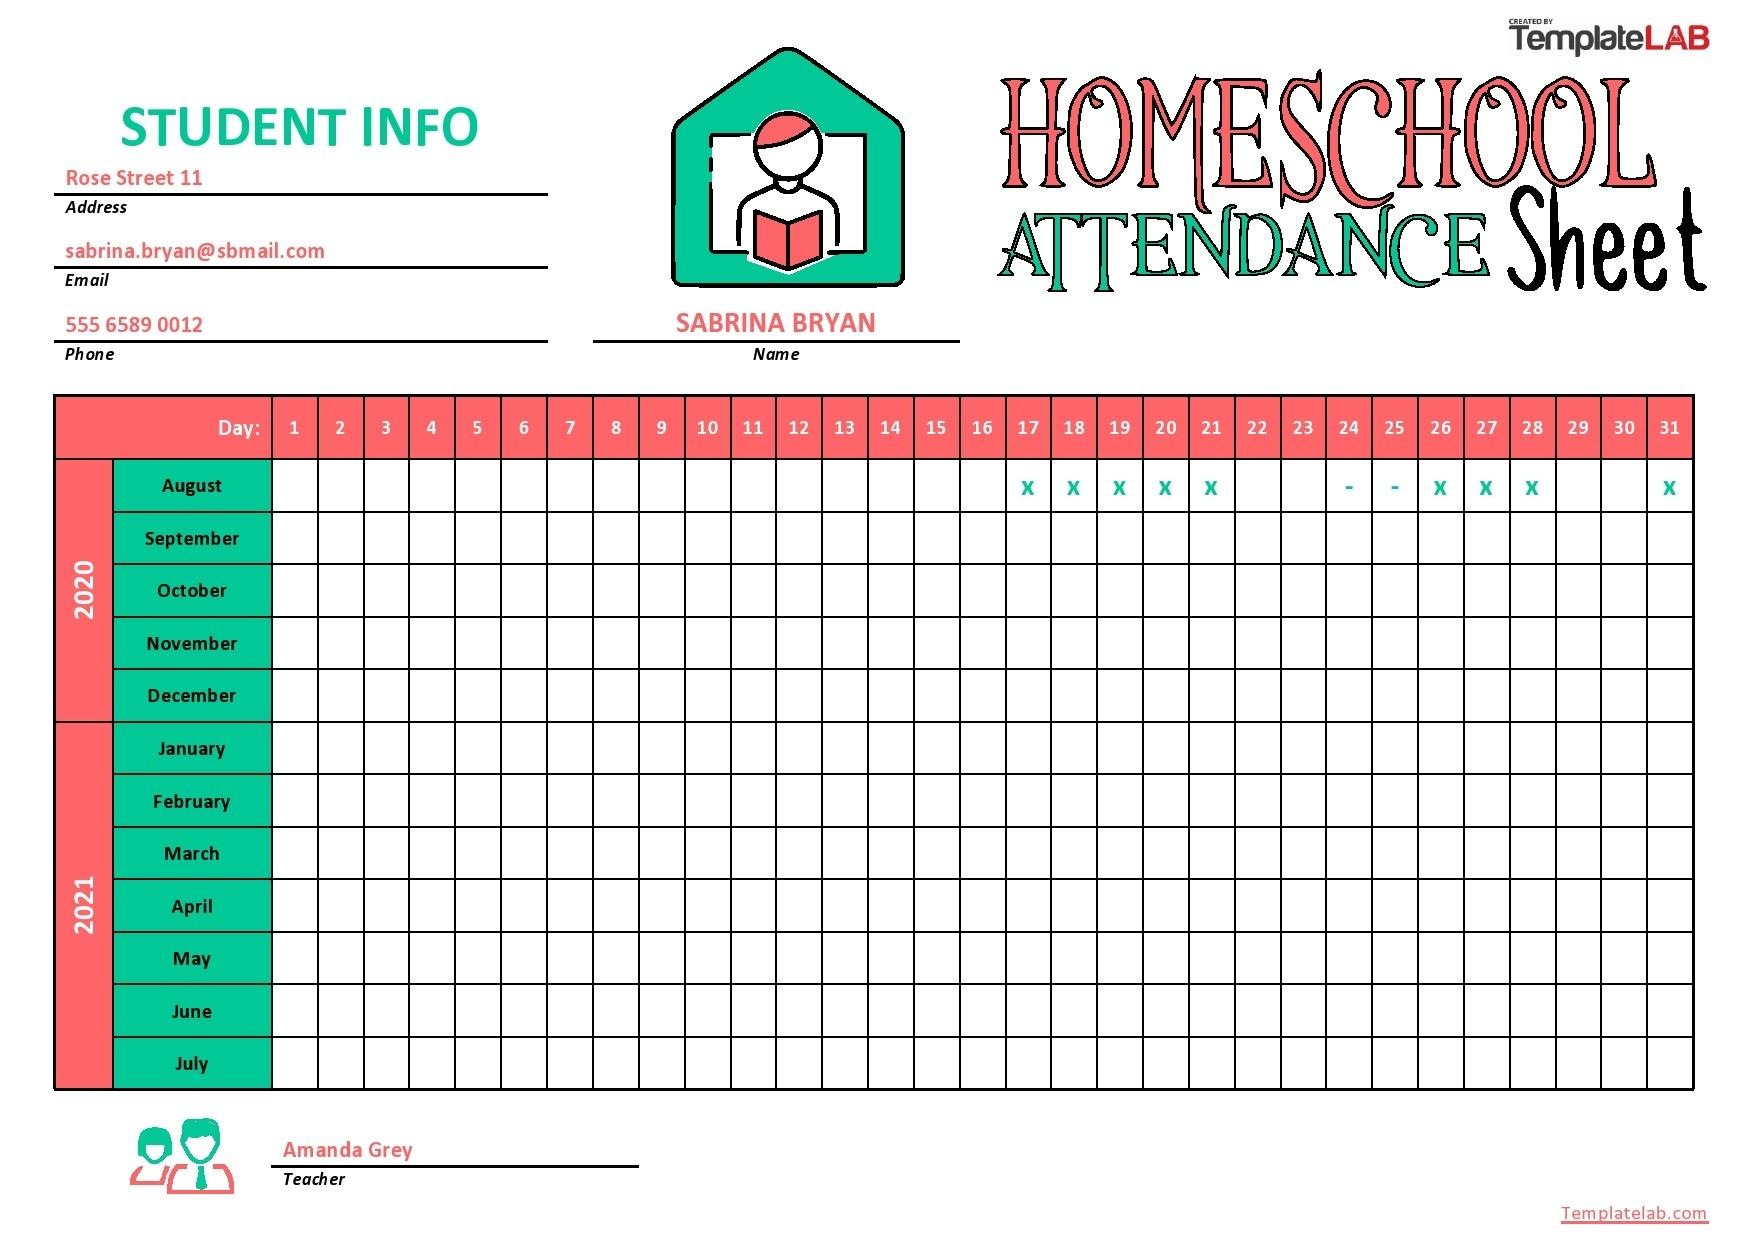 43 Free Printable Attendance Sheet Templates - Templatelab-Free Attendance Sheet Pdf 2021